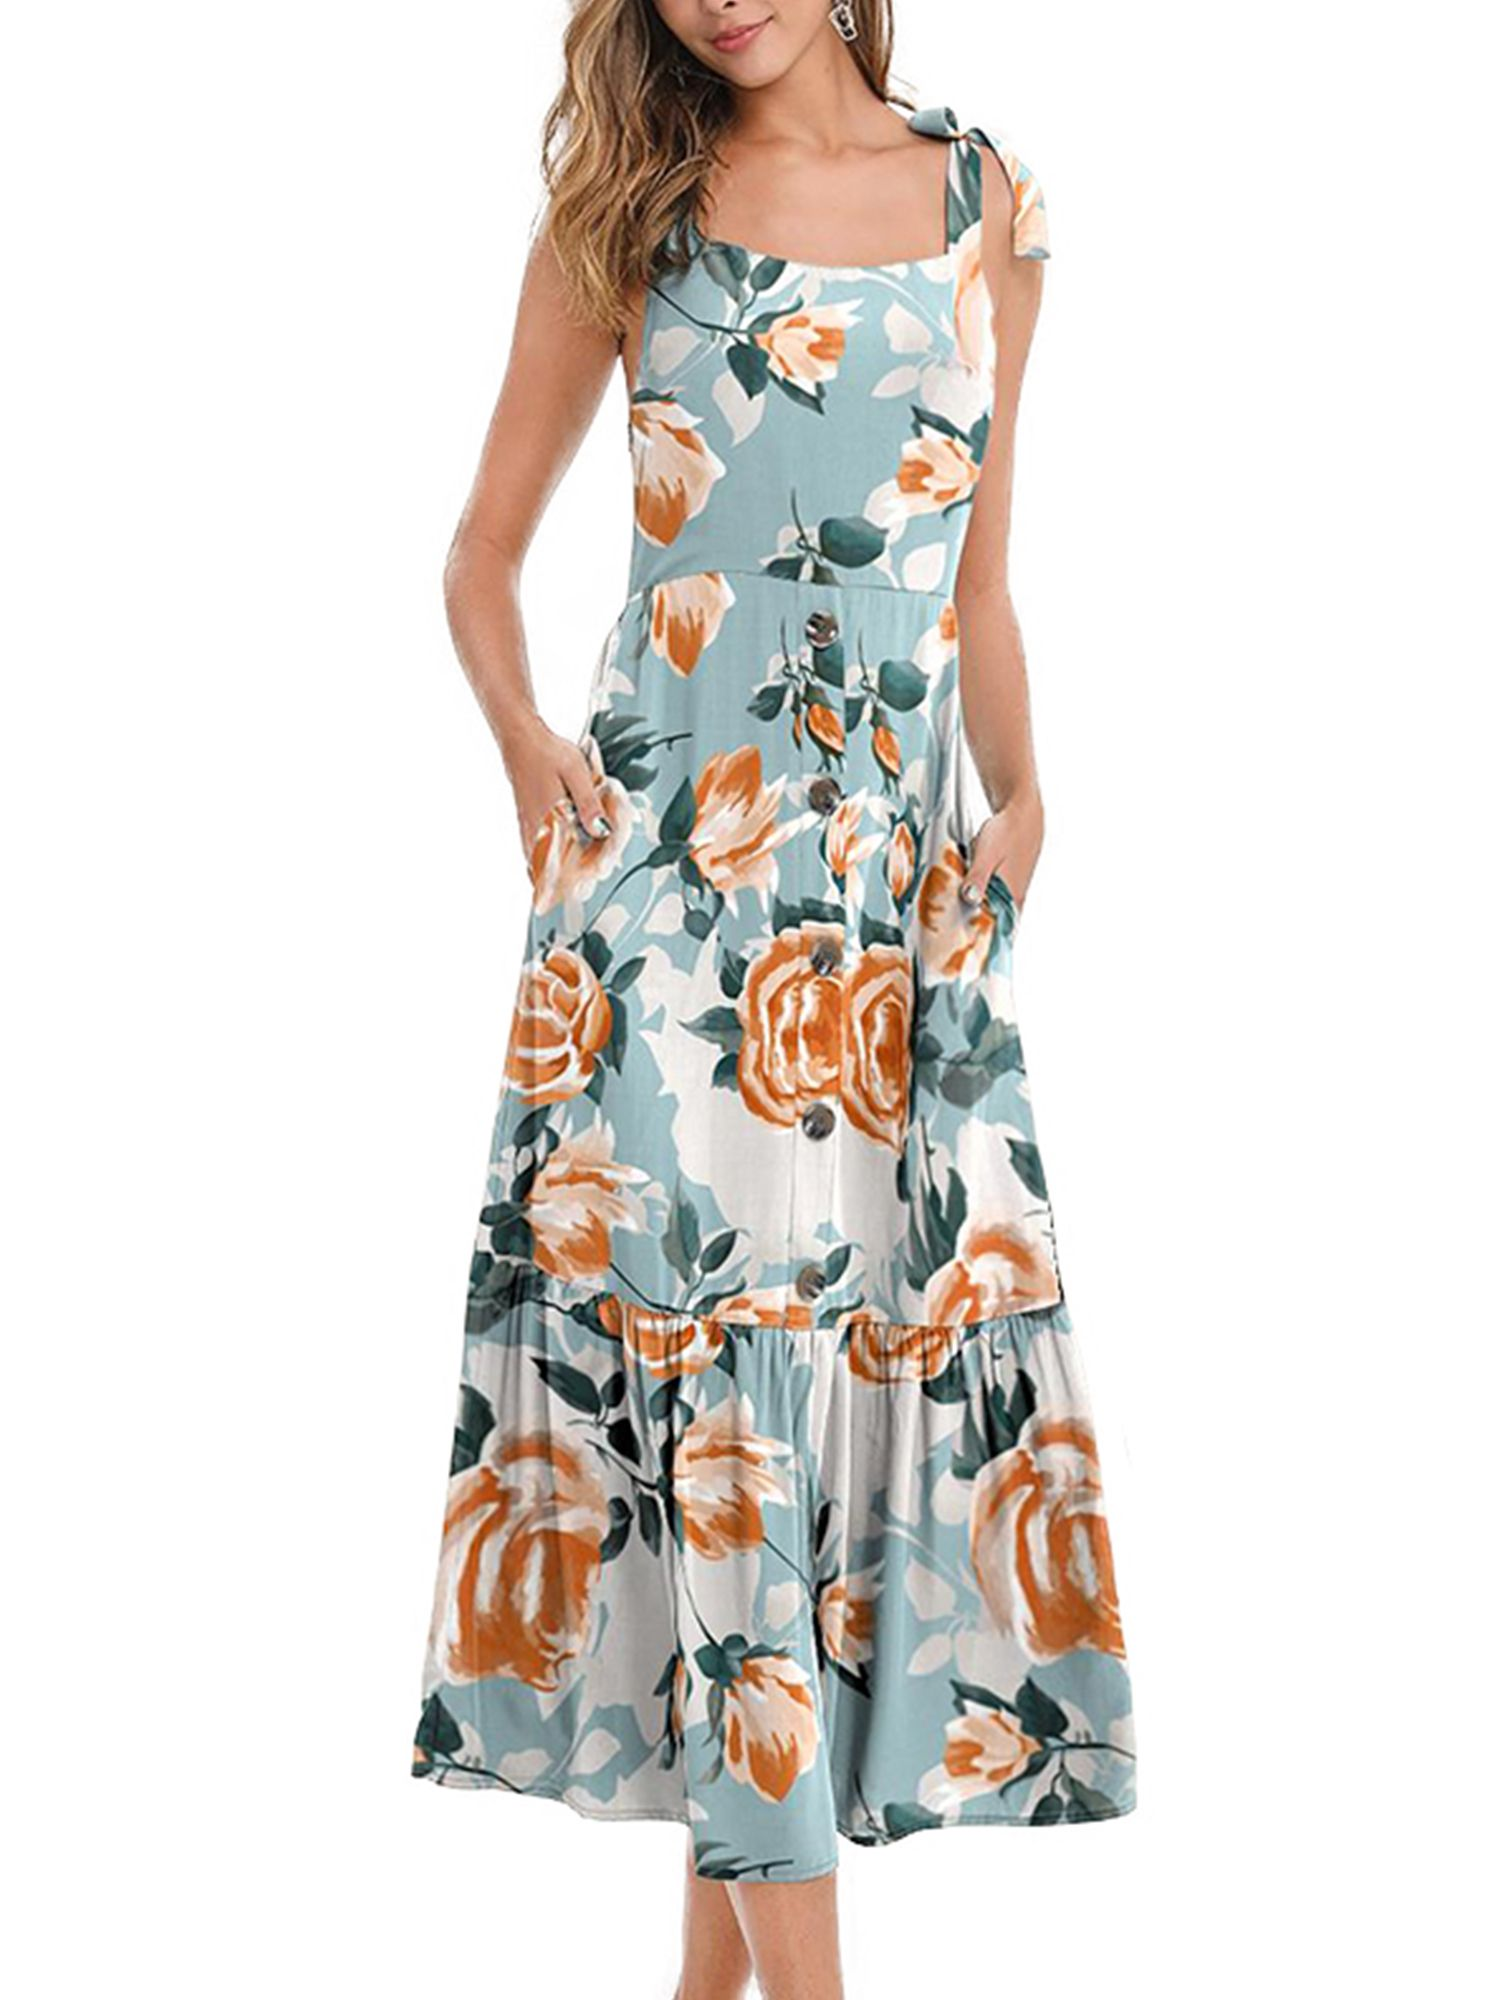 Lallc Women S Floral Sleeveless Long Dresses Party Cocktail Elegant Summer Sundress Walmart Com Sleeveless Long Dress Party Dress Long Summer Dresses Sundresses [ 2000 x 1500 Pixel ]